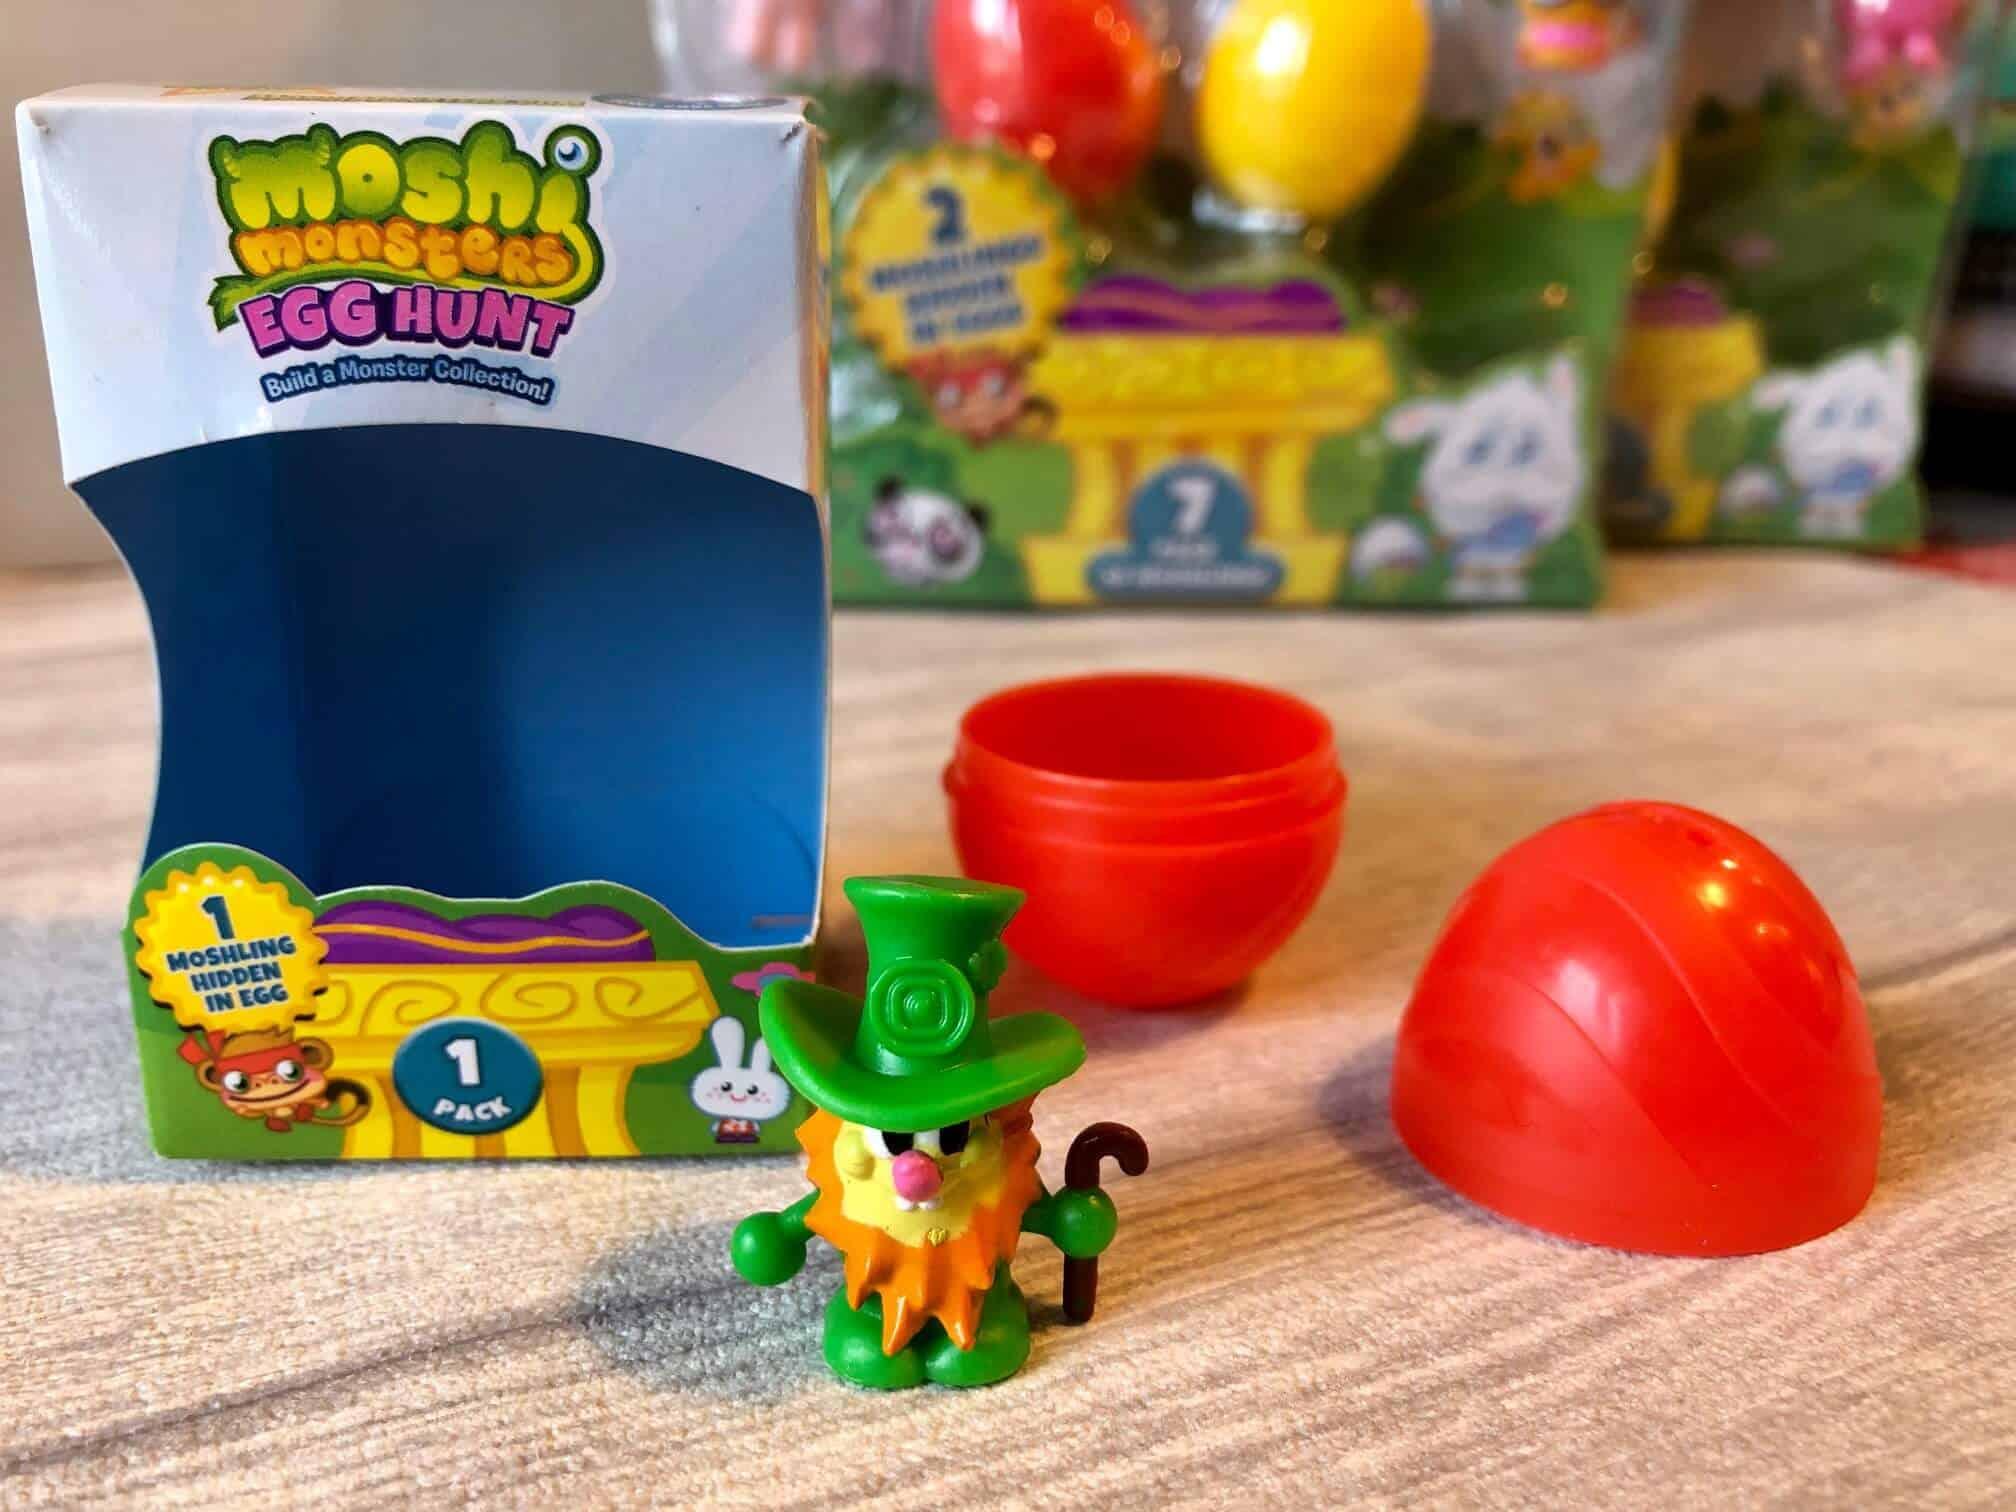 Moshi Monsters Egg Hunt 1 pack Luckie